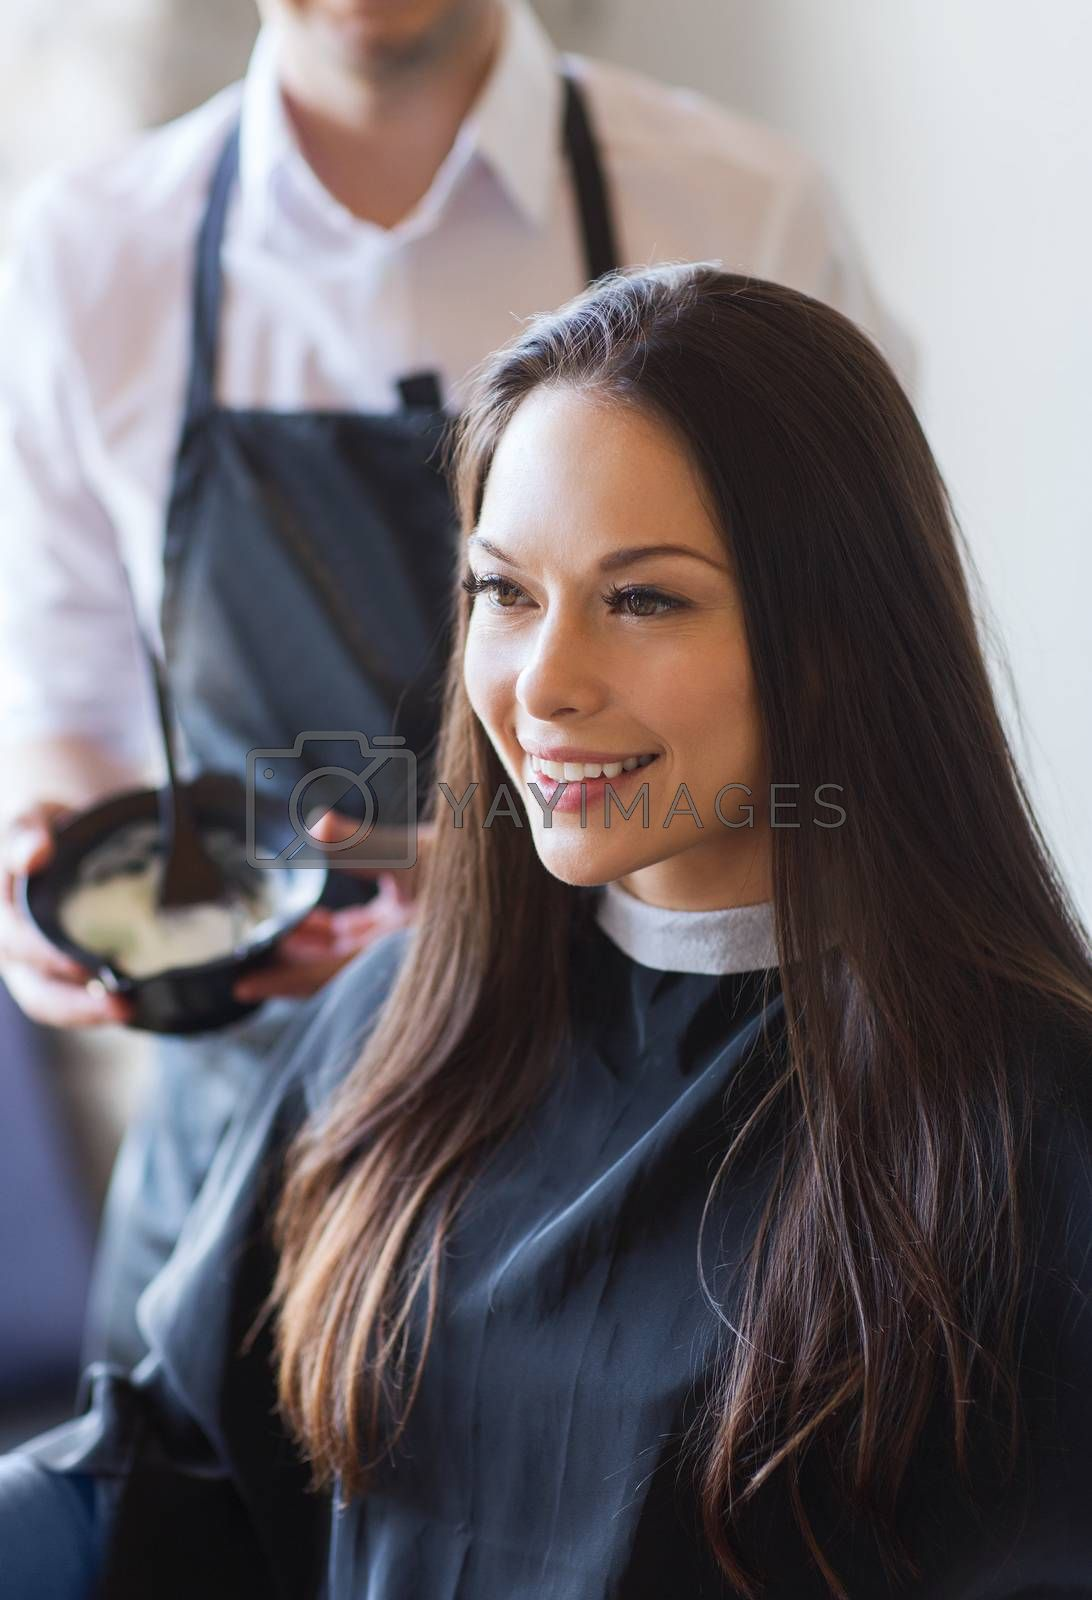 Royalty free image of happy young woman coloring hair at salon by dolgachov